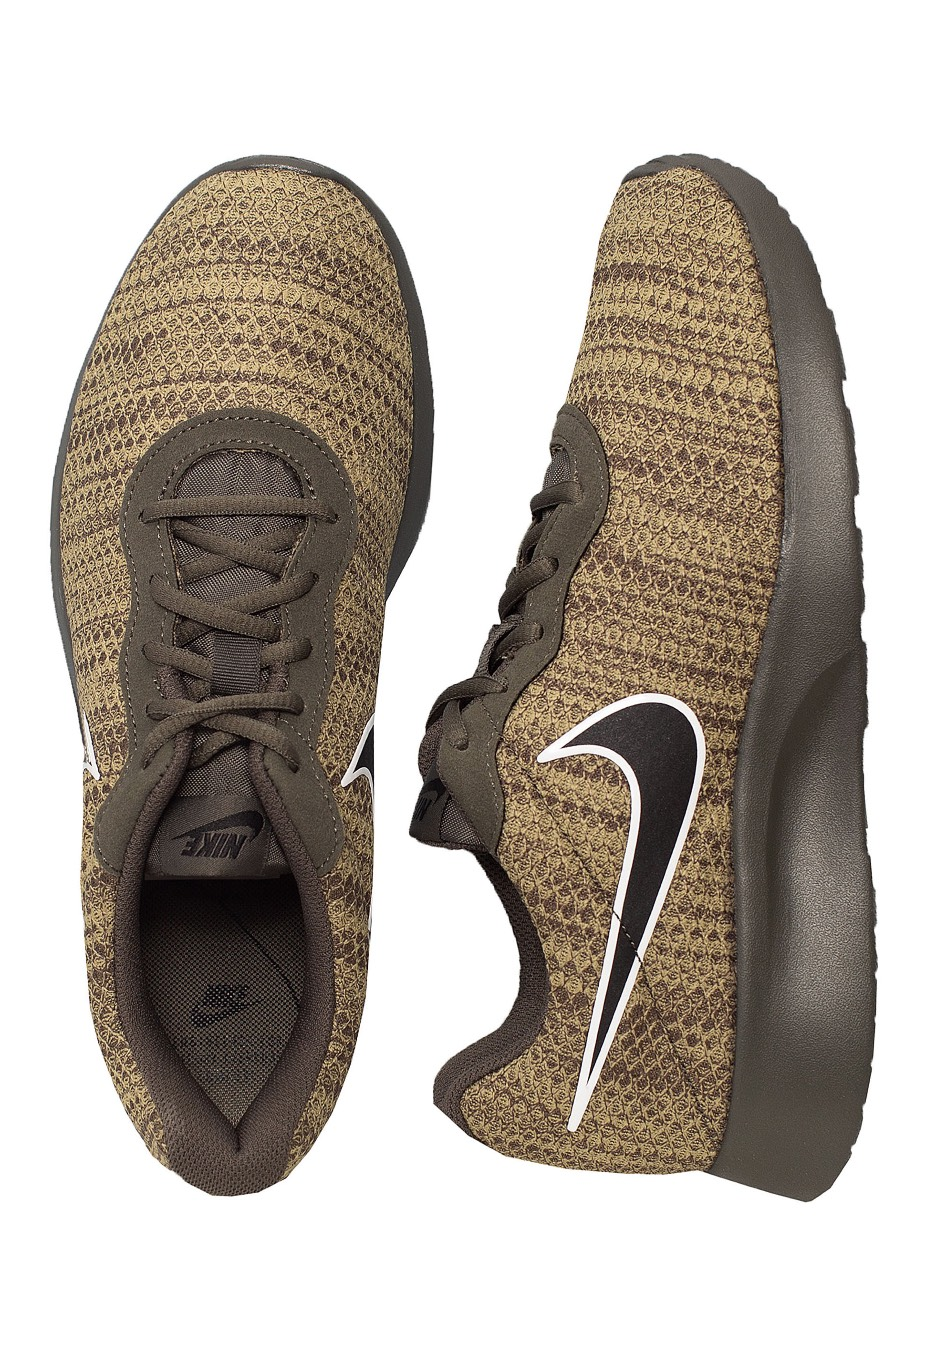 42897dec52 Nike - Tanjun Premium Cargo Khaki/Black/Neutral Olive - Shoes -  Impericon.com Worldwide